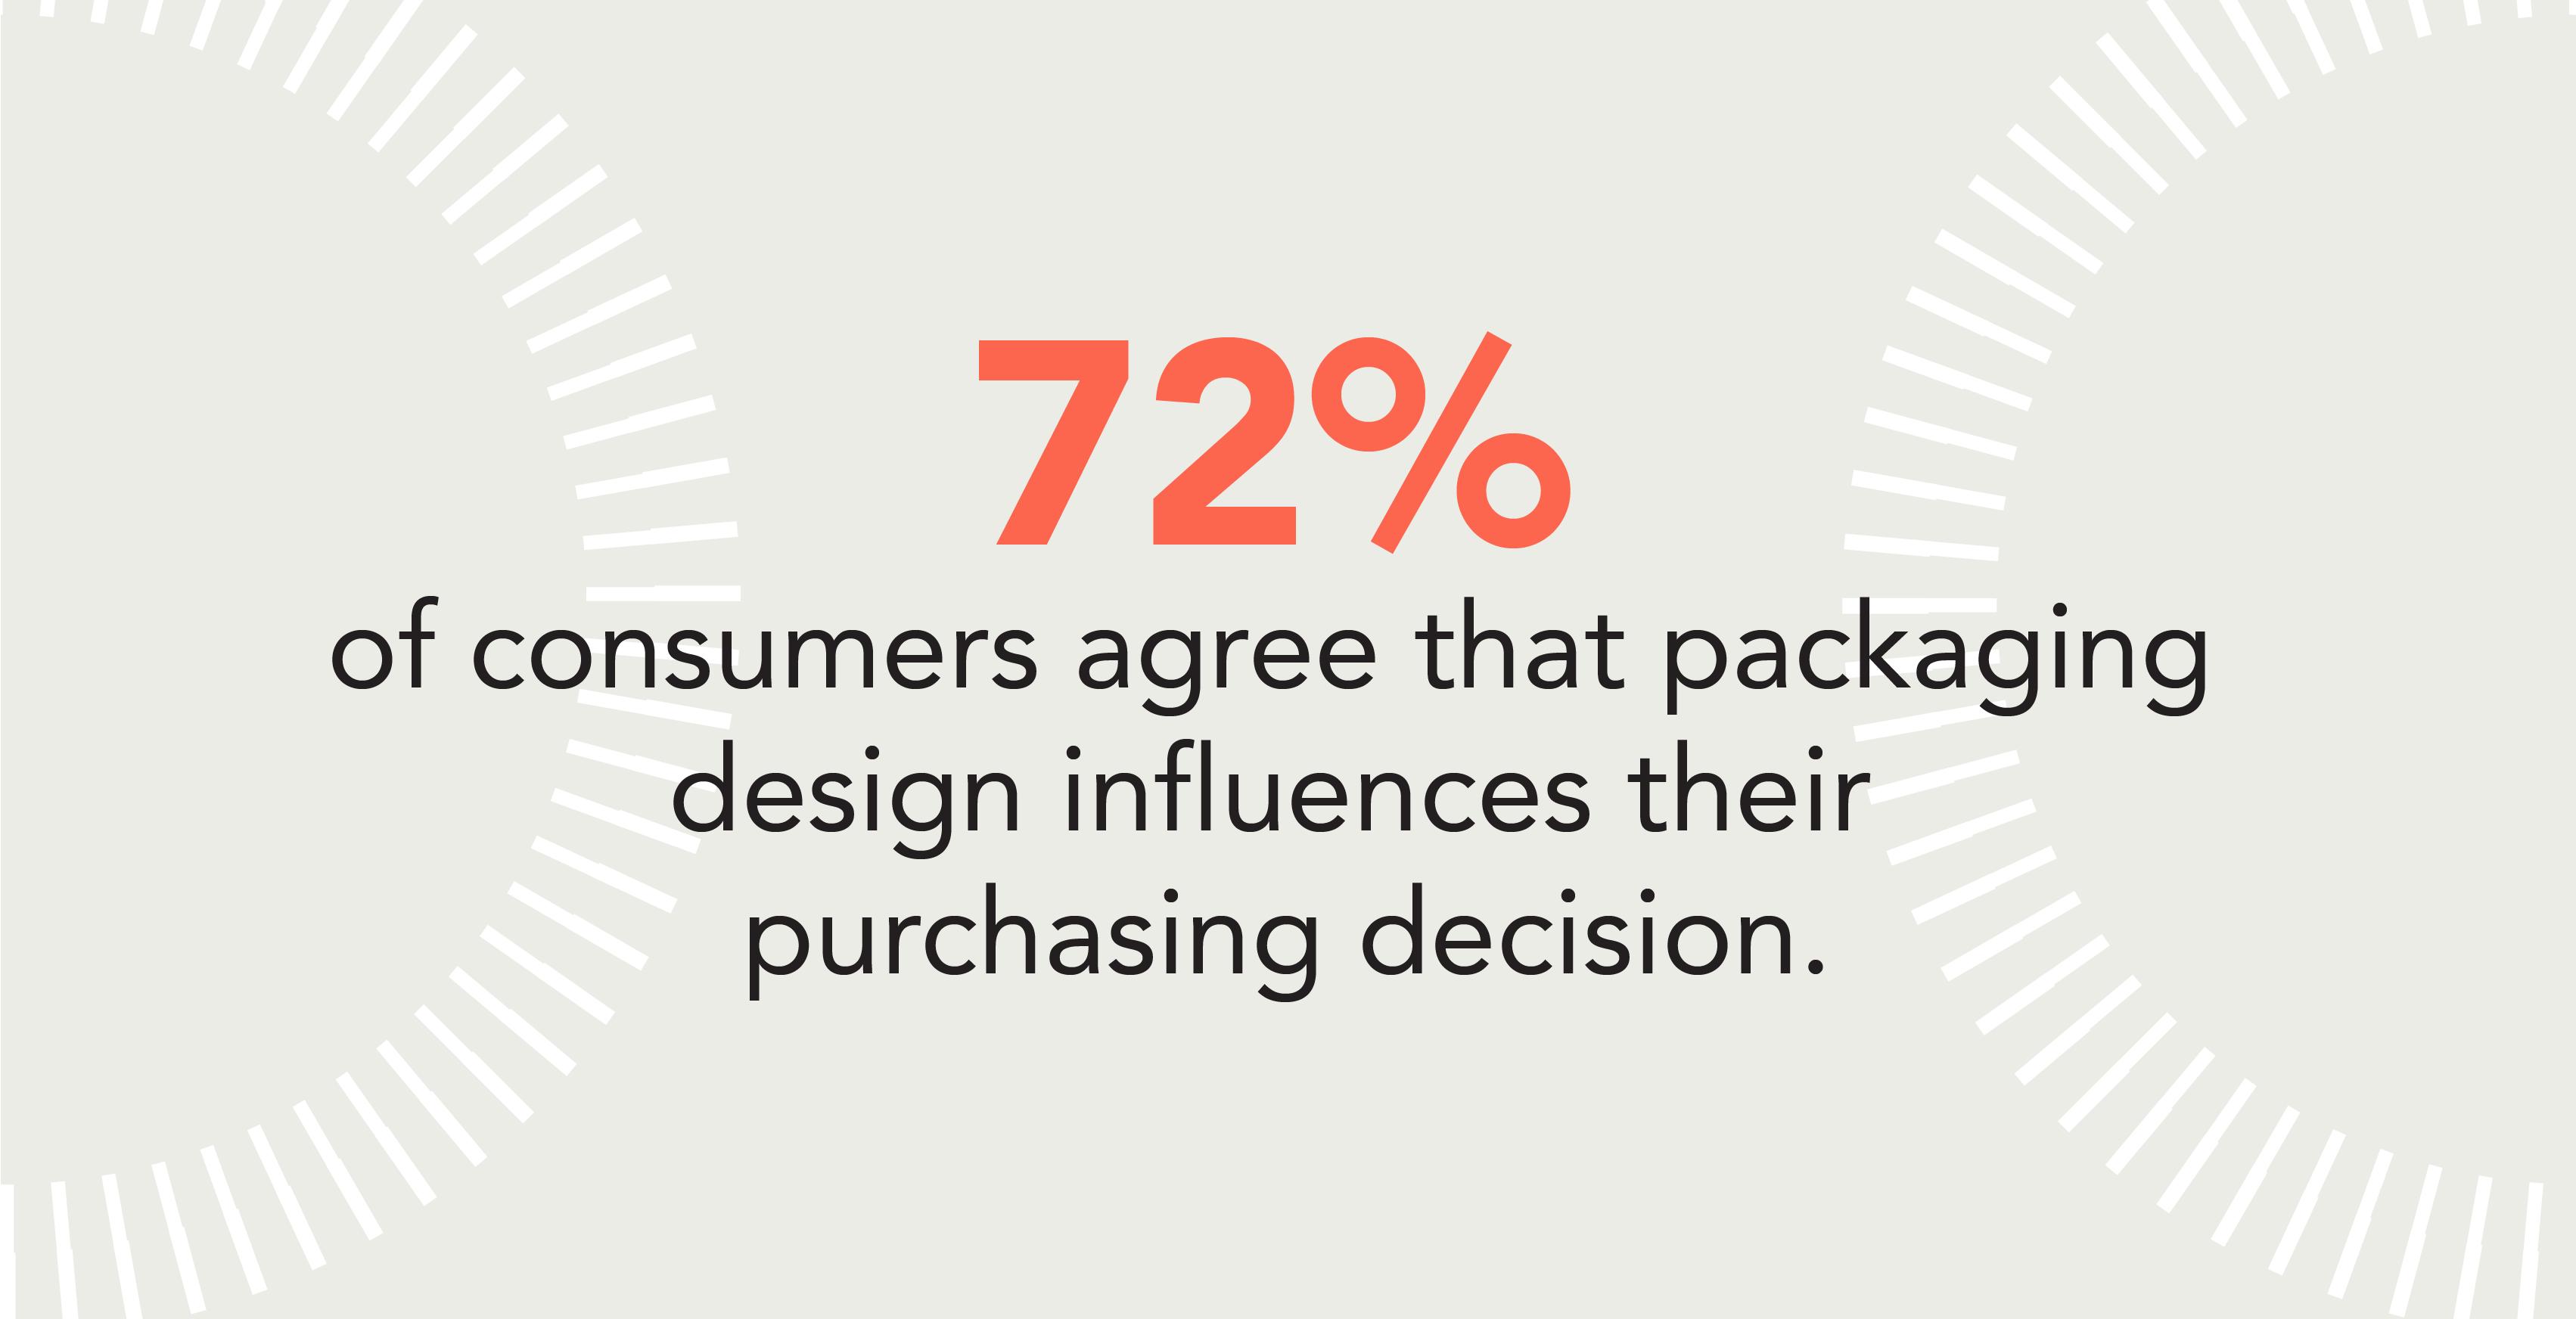 design influences purchasiing decisions